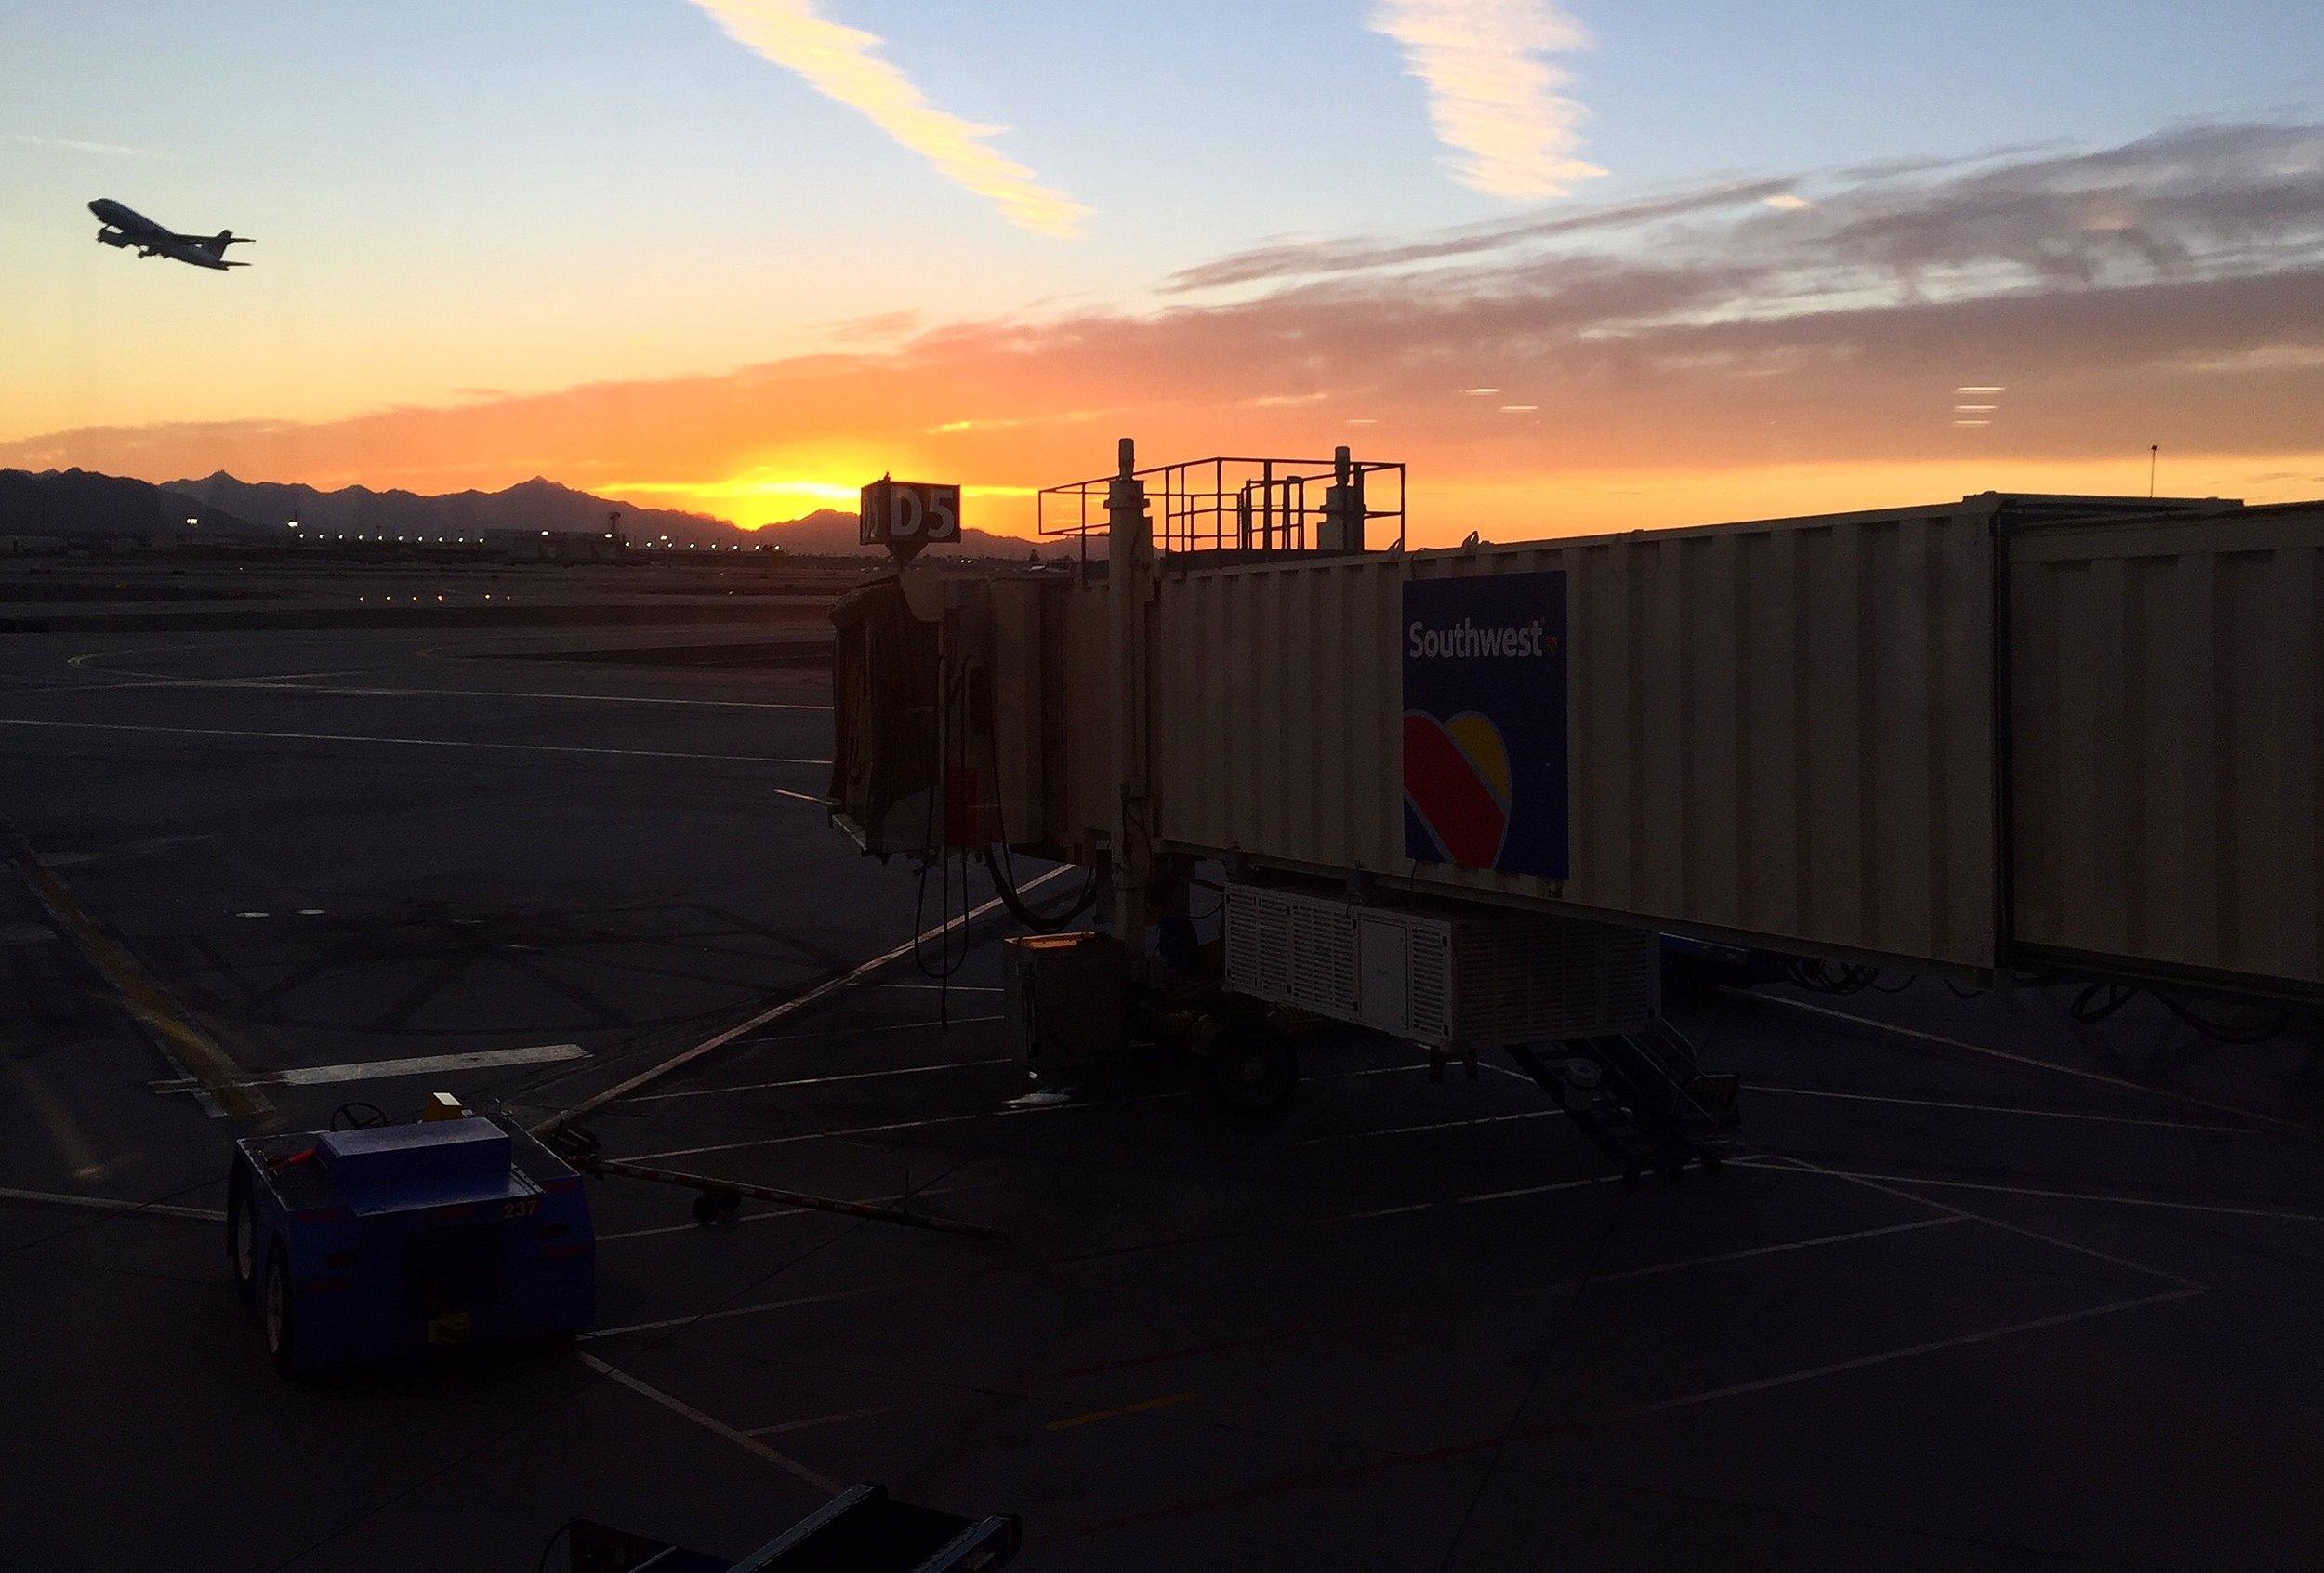 Sunset at Phoenix Sky Harbor